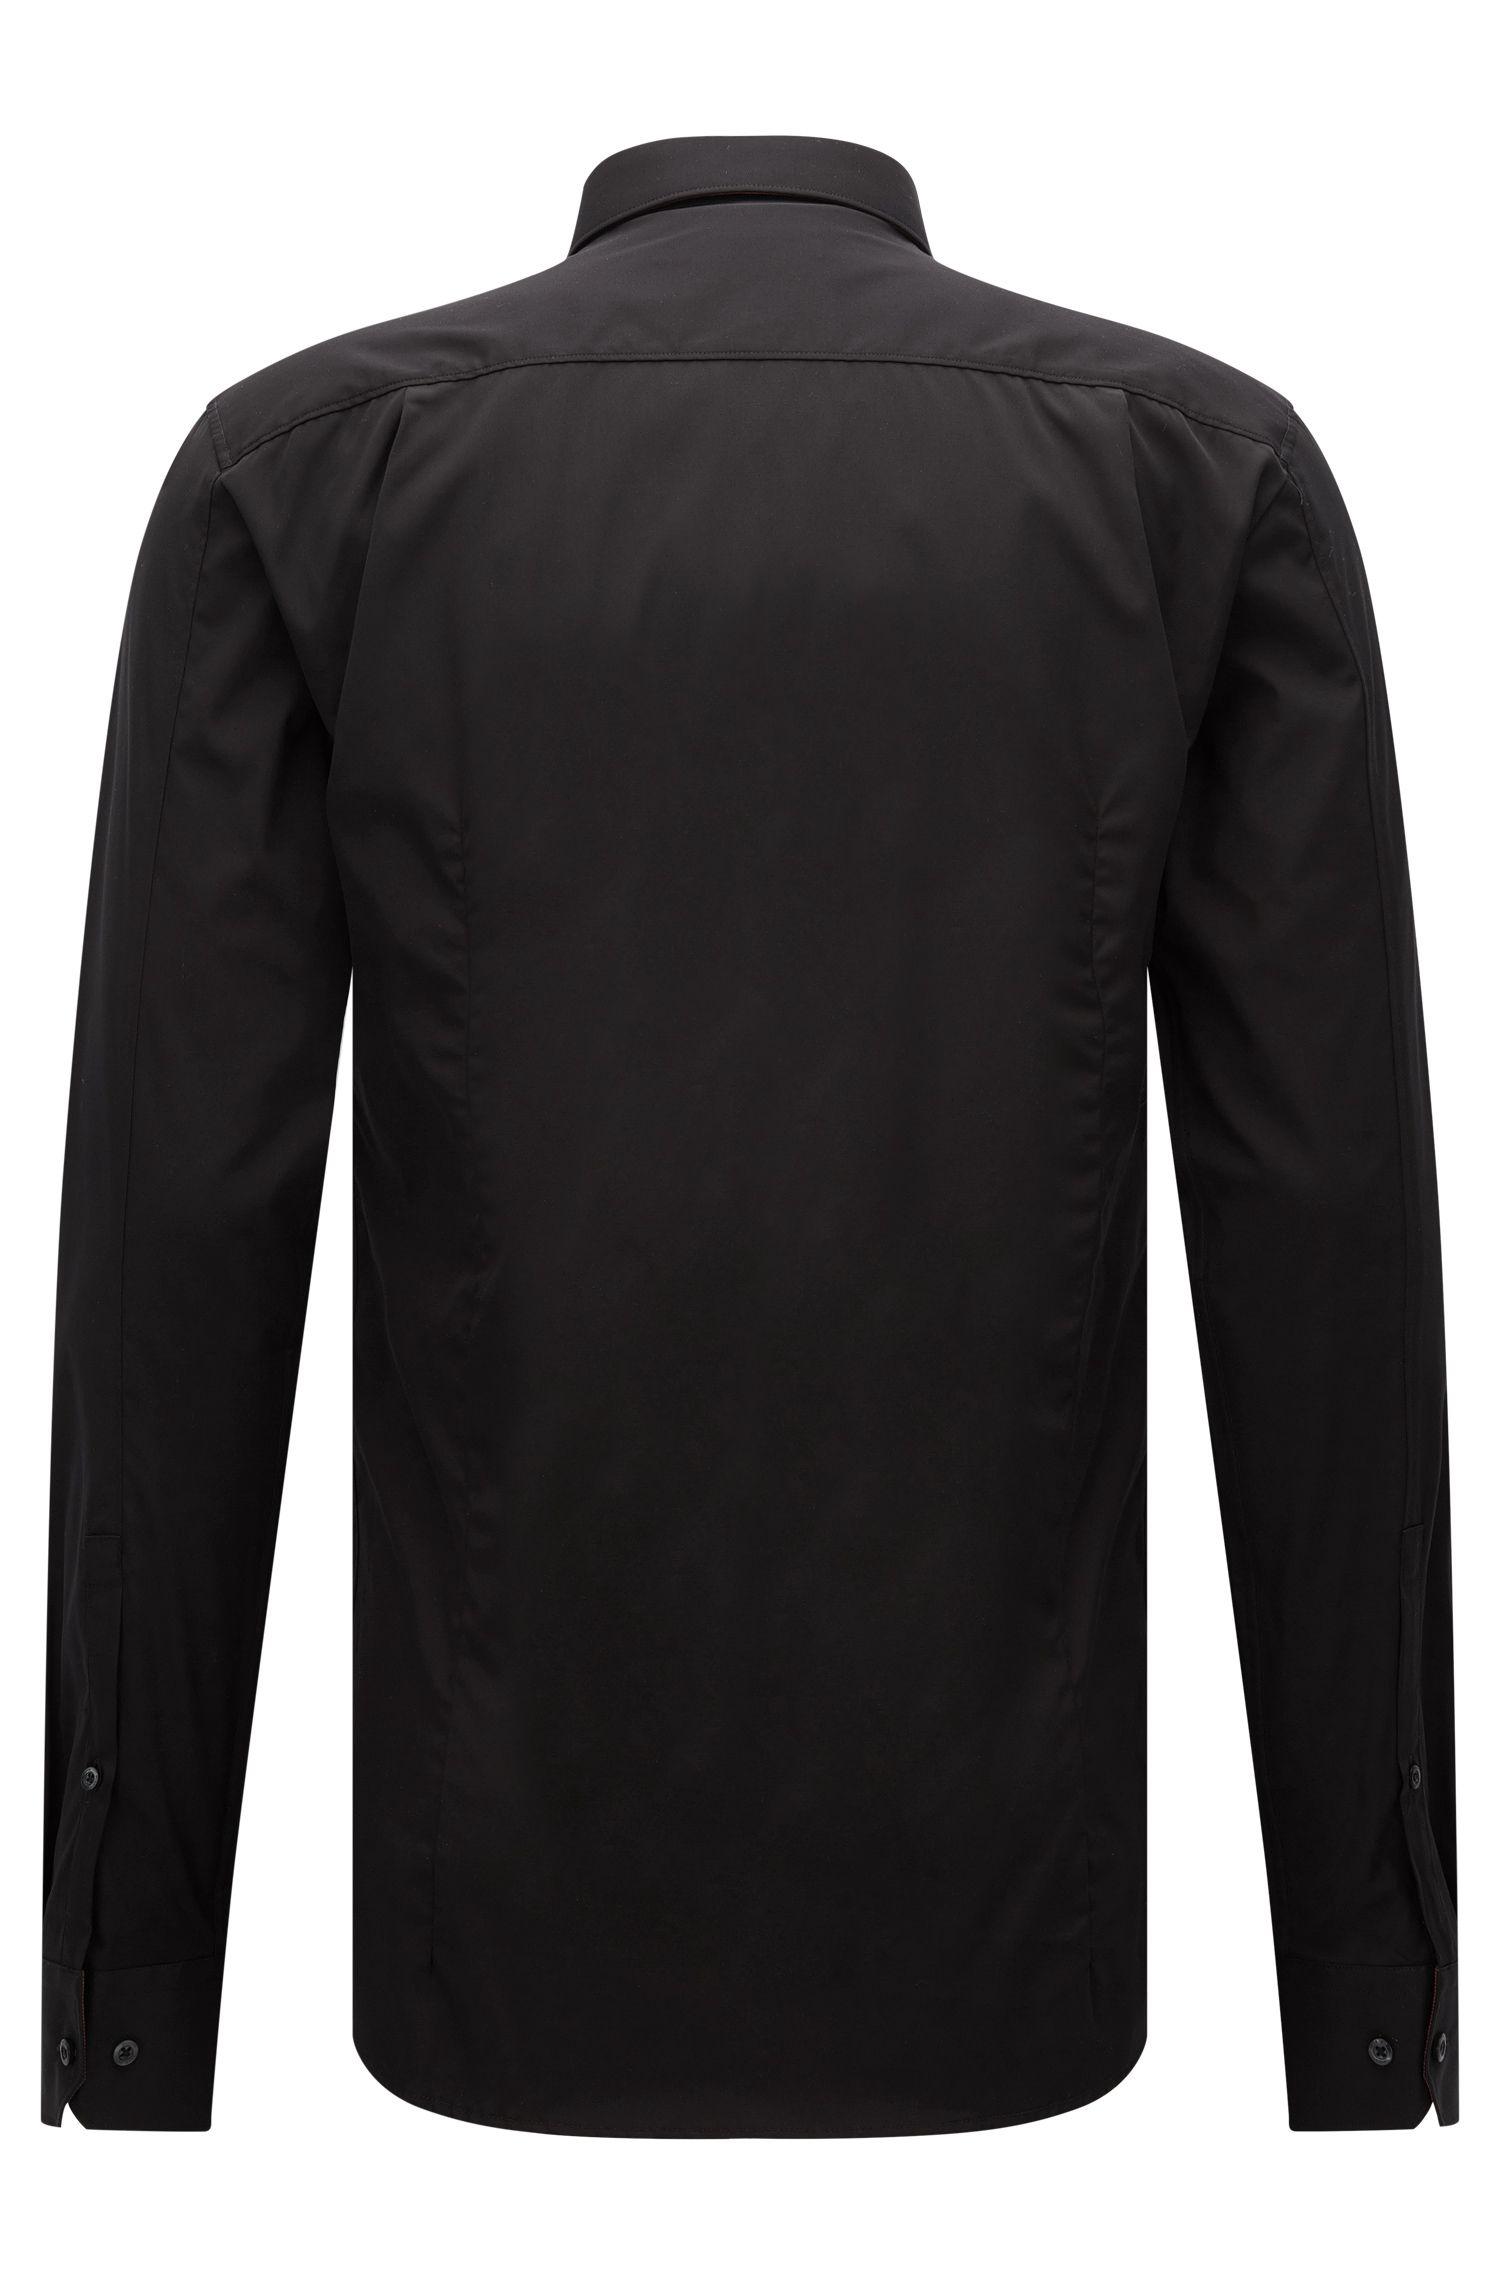 Cotton Easy Iron Button Down Shirt, Extra Slim Fit | Elisha, Black